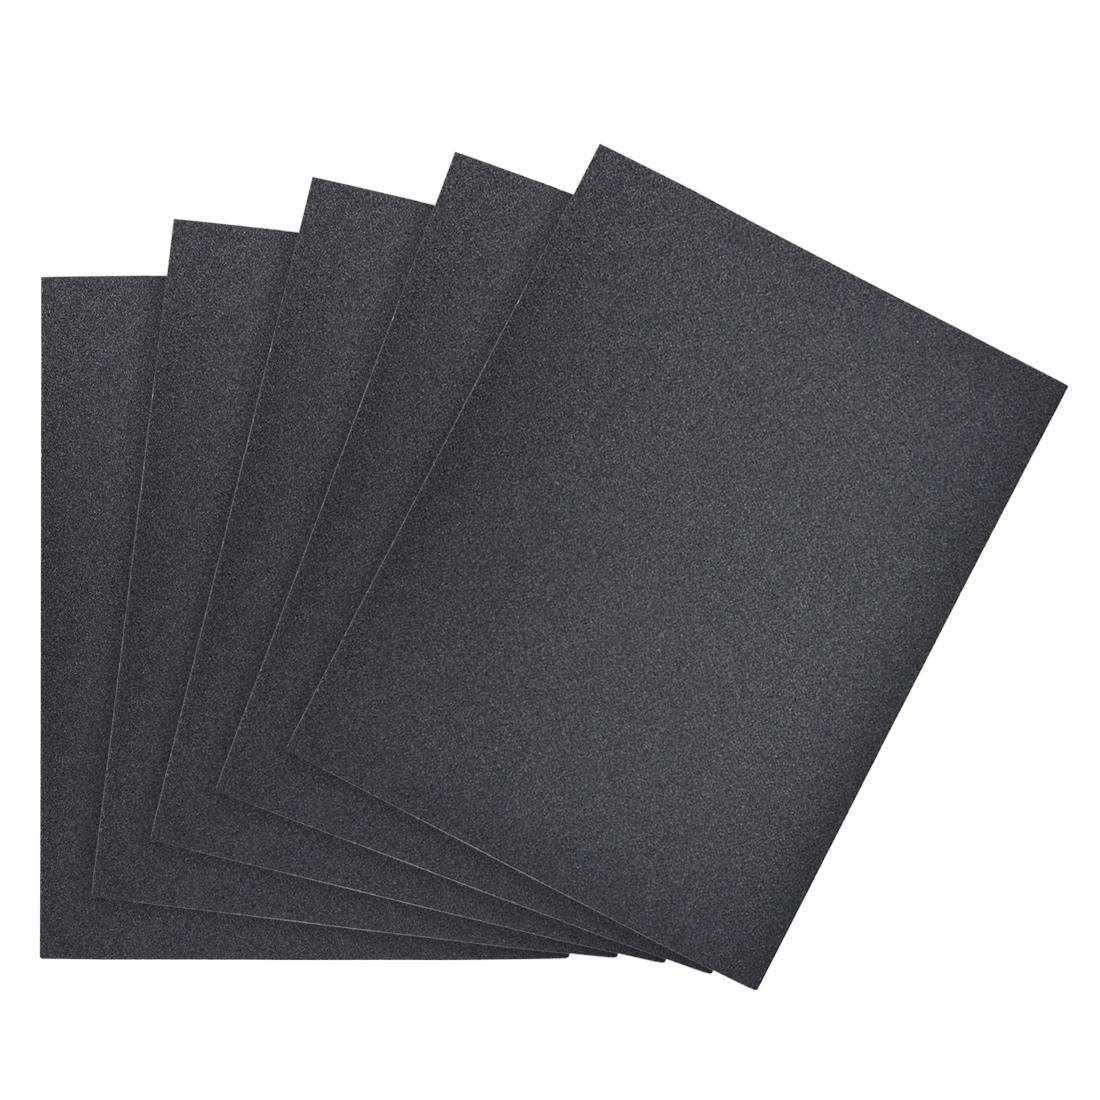 Waterproof Sandpaper, Wet Dry Sand Paper Grit of 120, 11 x 9inch 5pcs